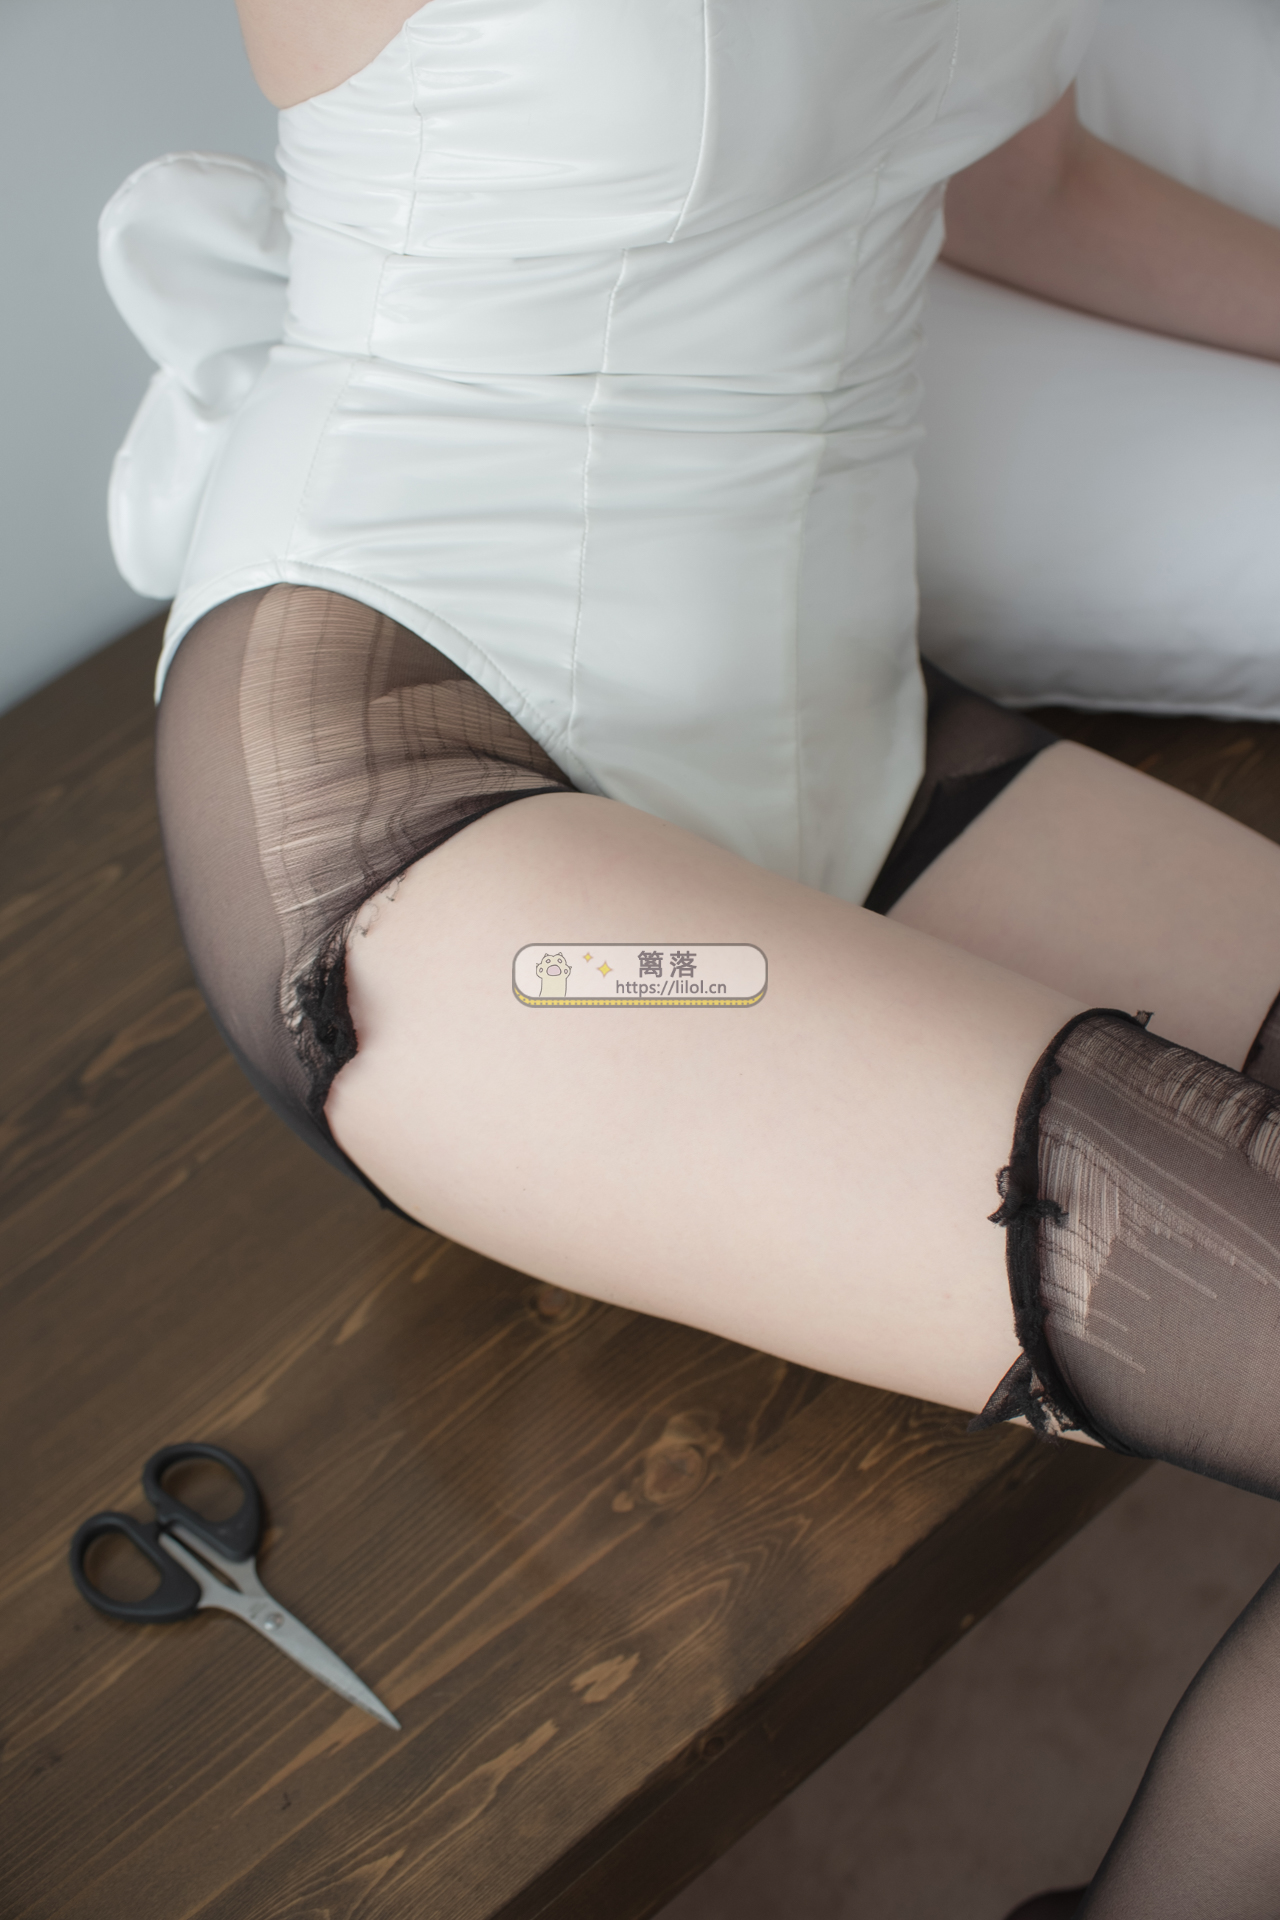 【LOVEPLUS系列】森萝财团写真 LOVEPLUS-001 性感兔女郎超薄黑丝+裸足大秀事业线 [148图-1视频-2.91GB] LOVEPLUS系列 第10张